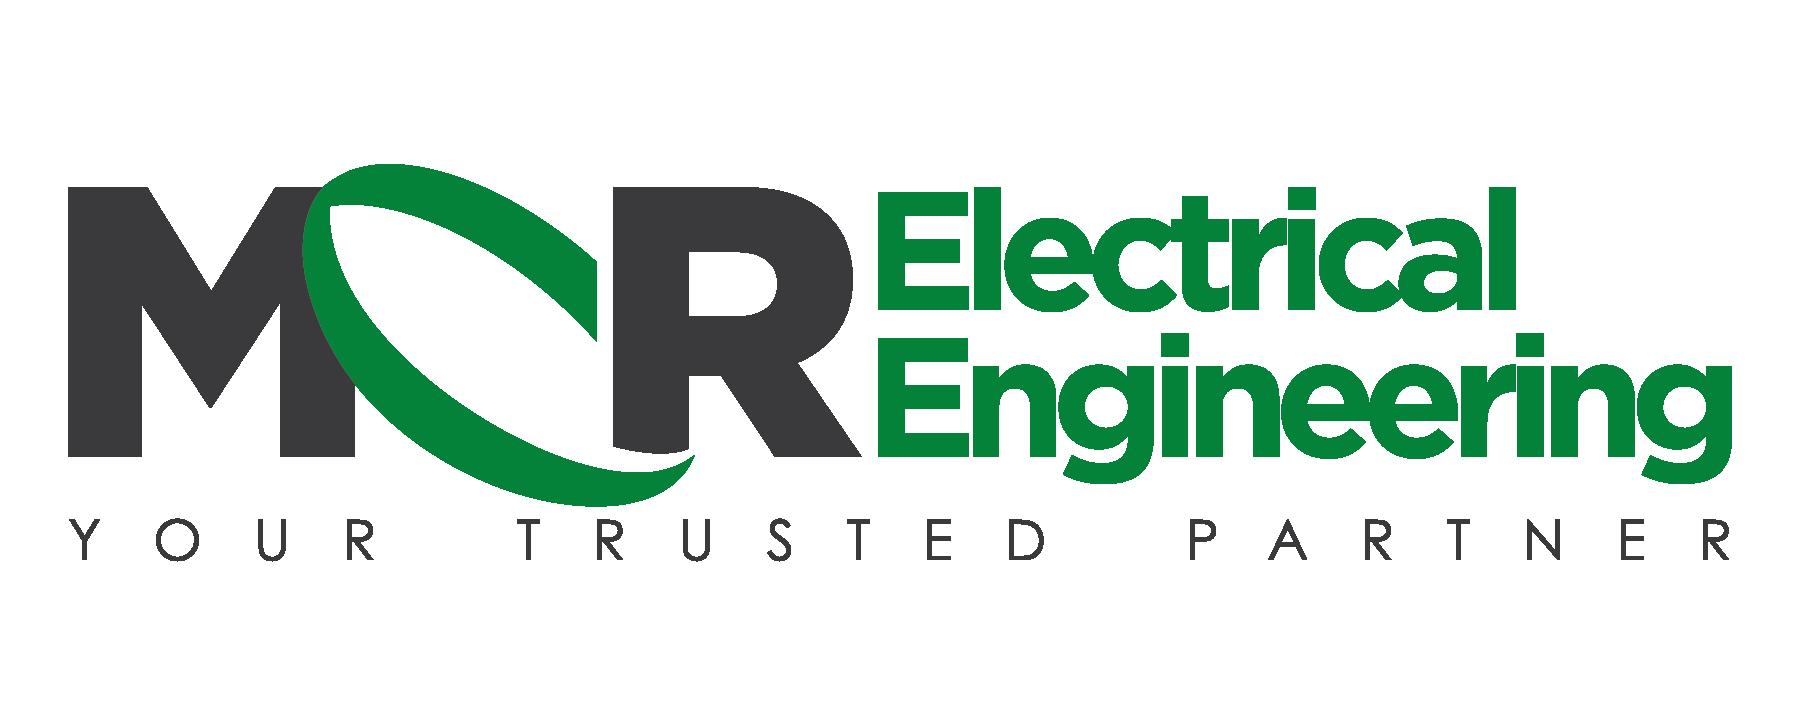 MCR Electrical Engineering